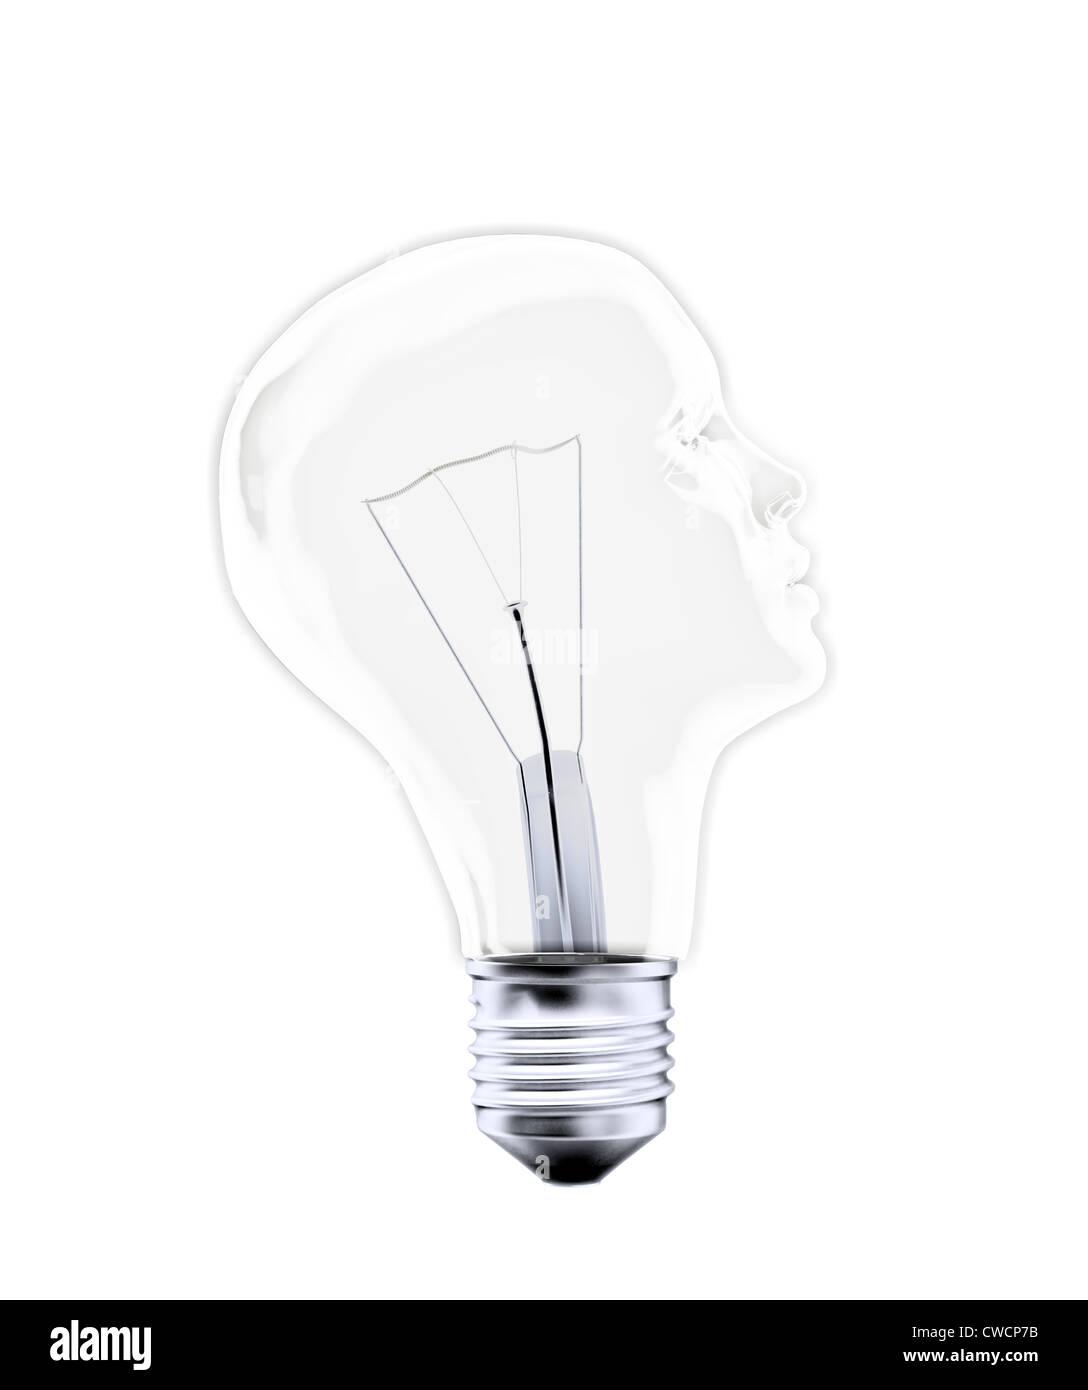 Head shaped bulb - creativity concept - Stock Image